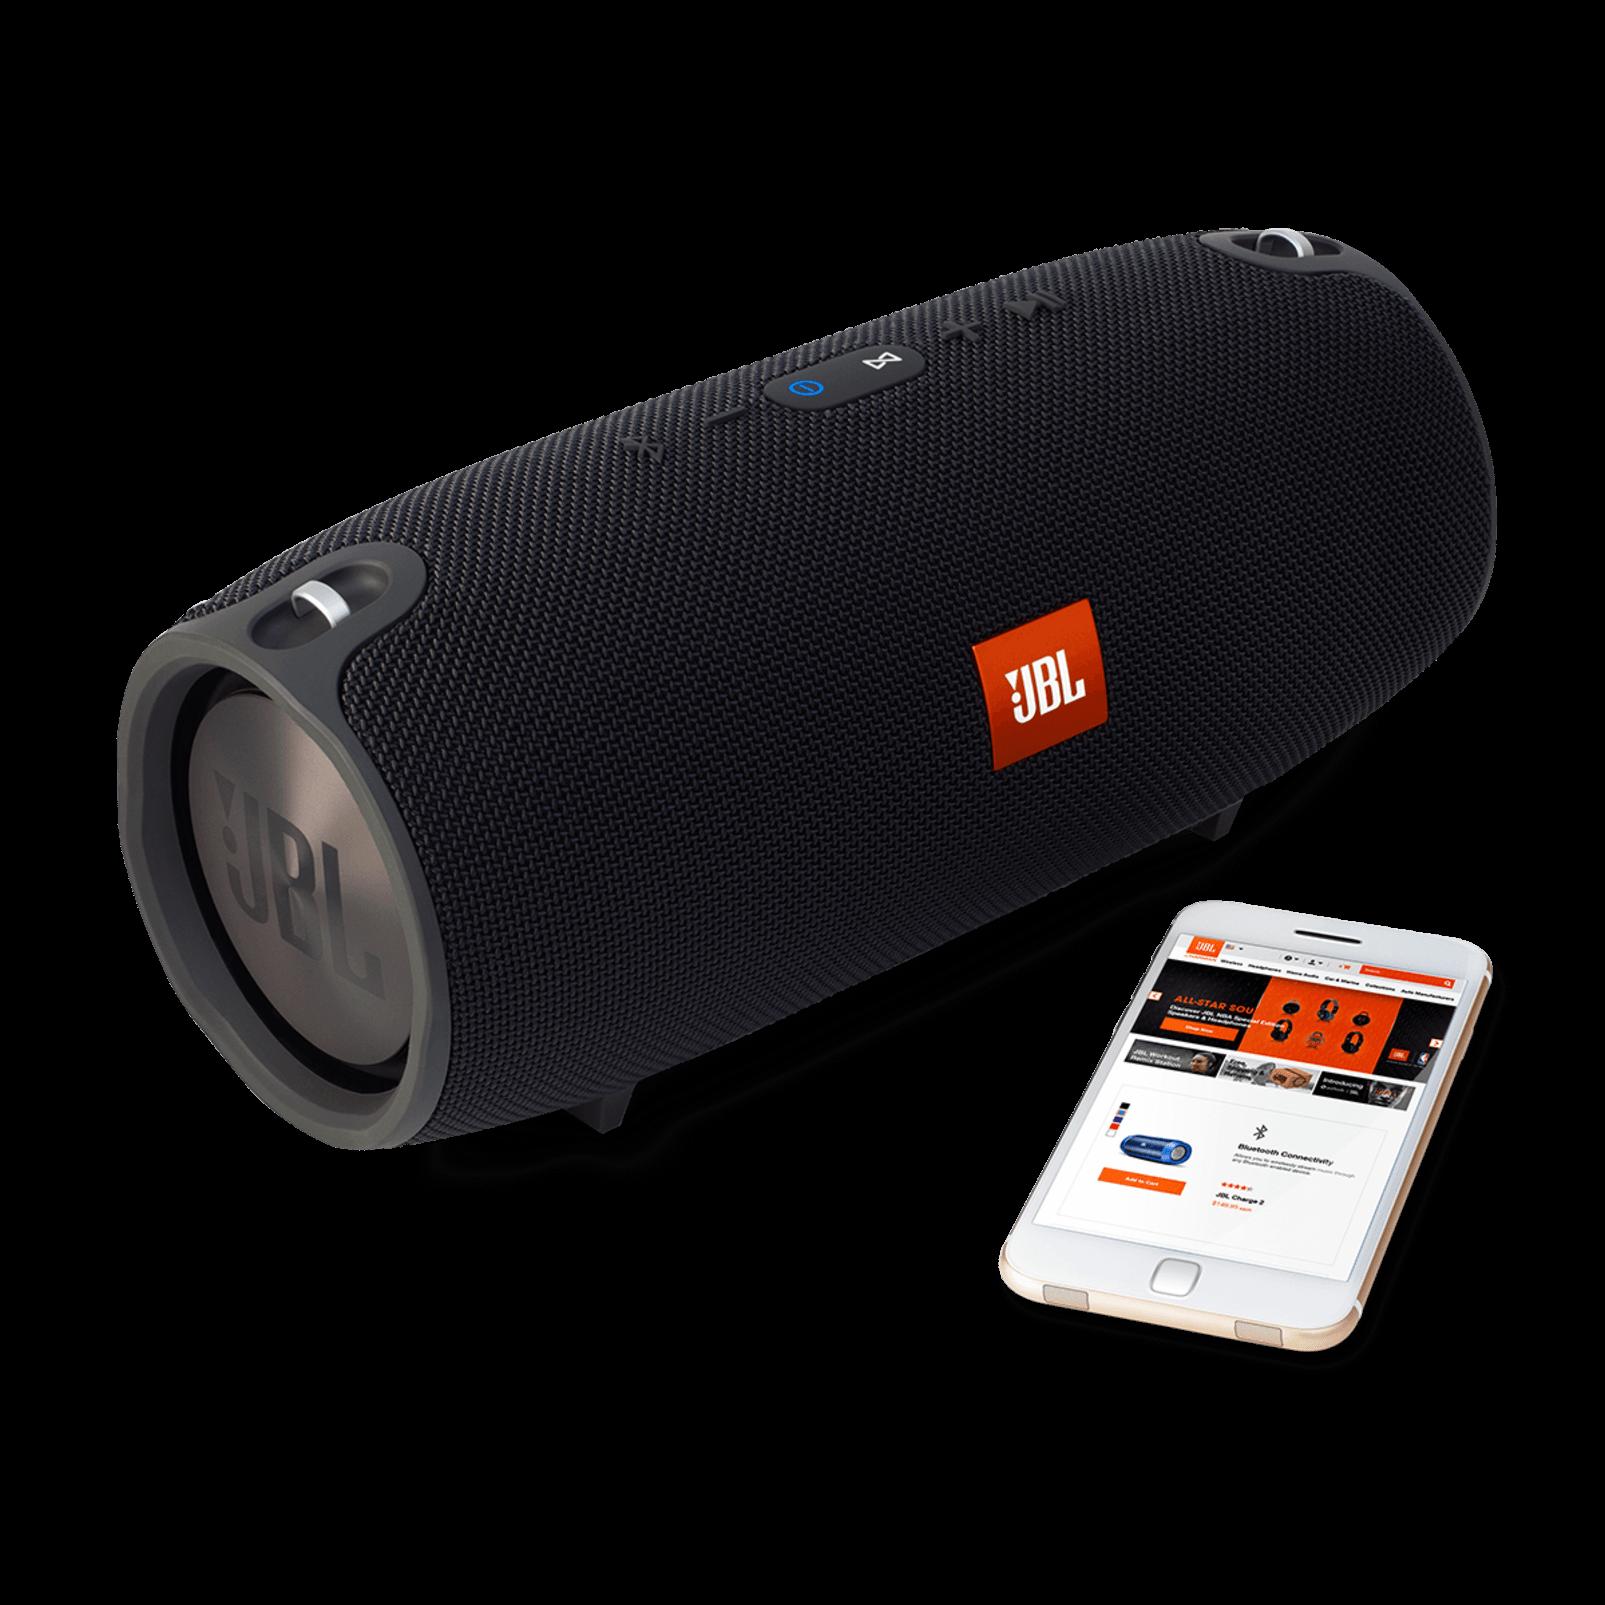 jbl-bluetooth-speakers-5